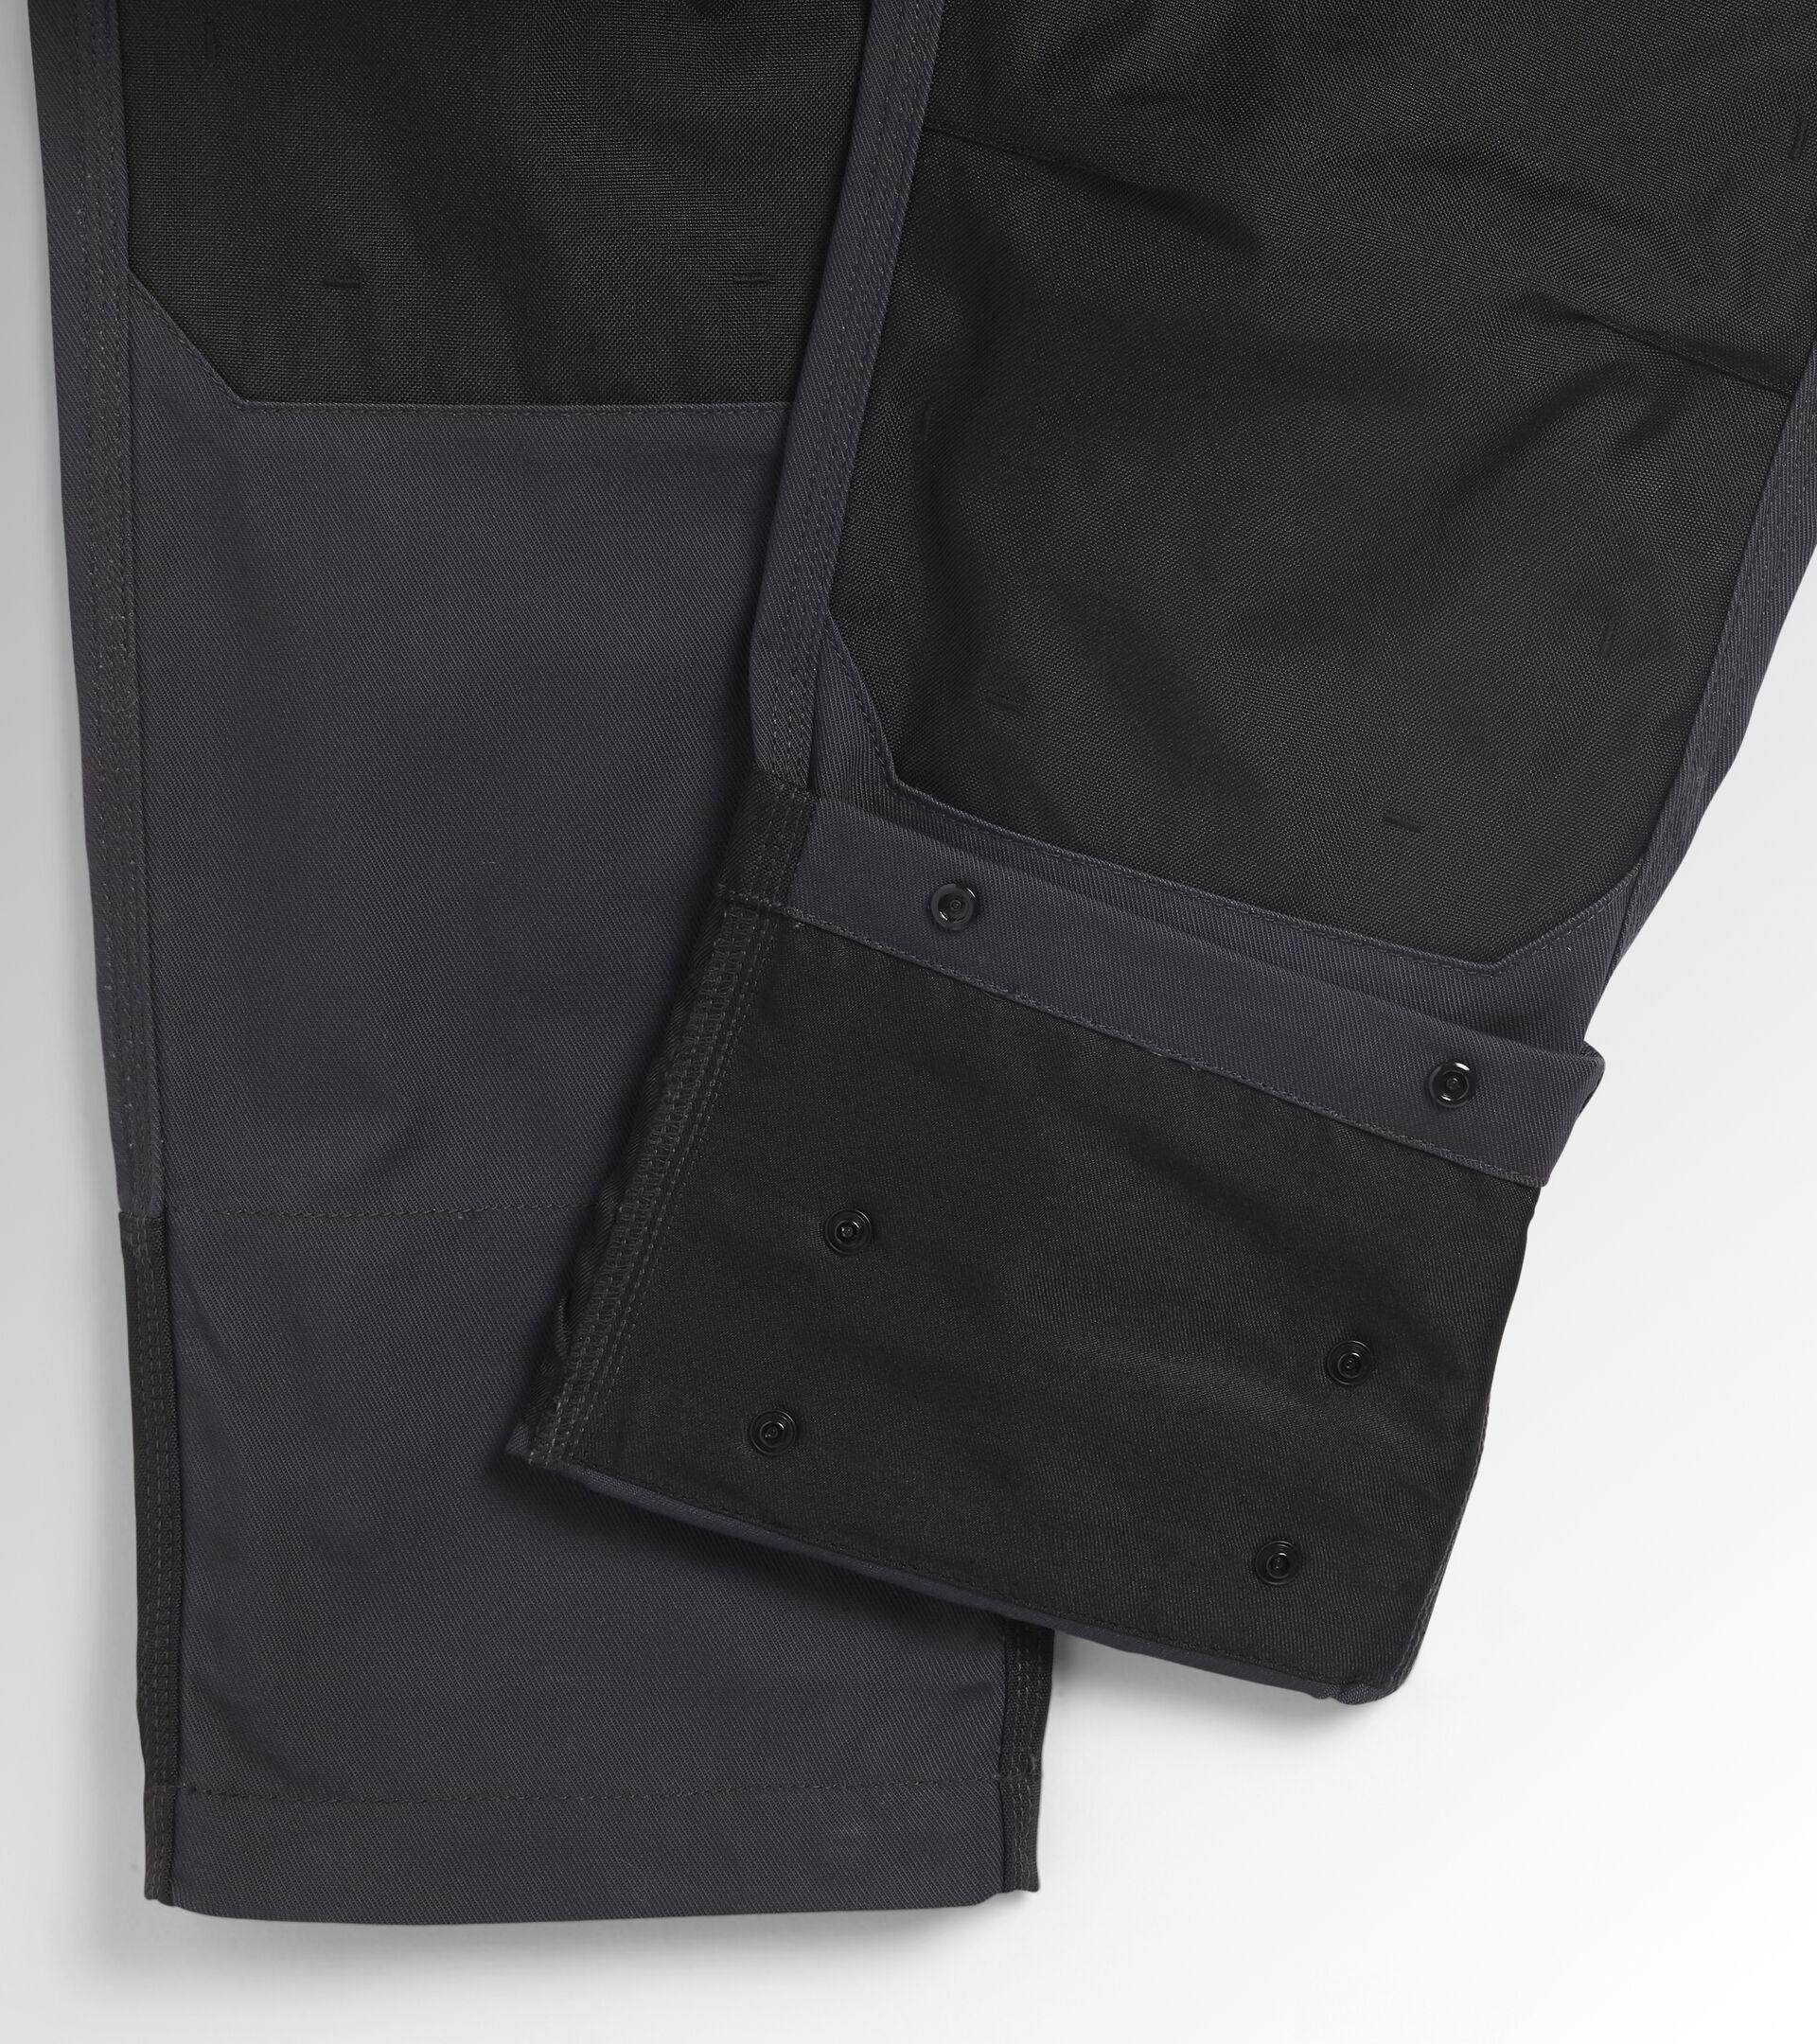 Apparel Utility UOMO PANT EASYWORK PERFORMANCE BLACK COAL Utility